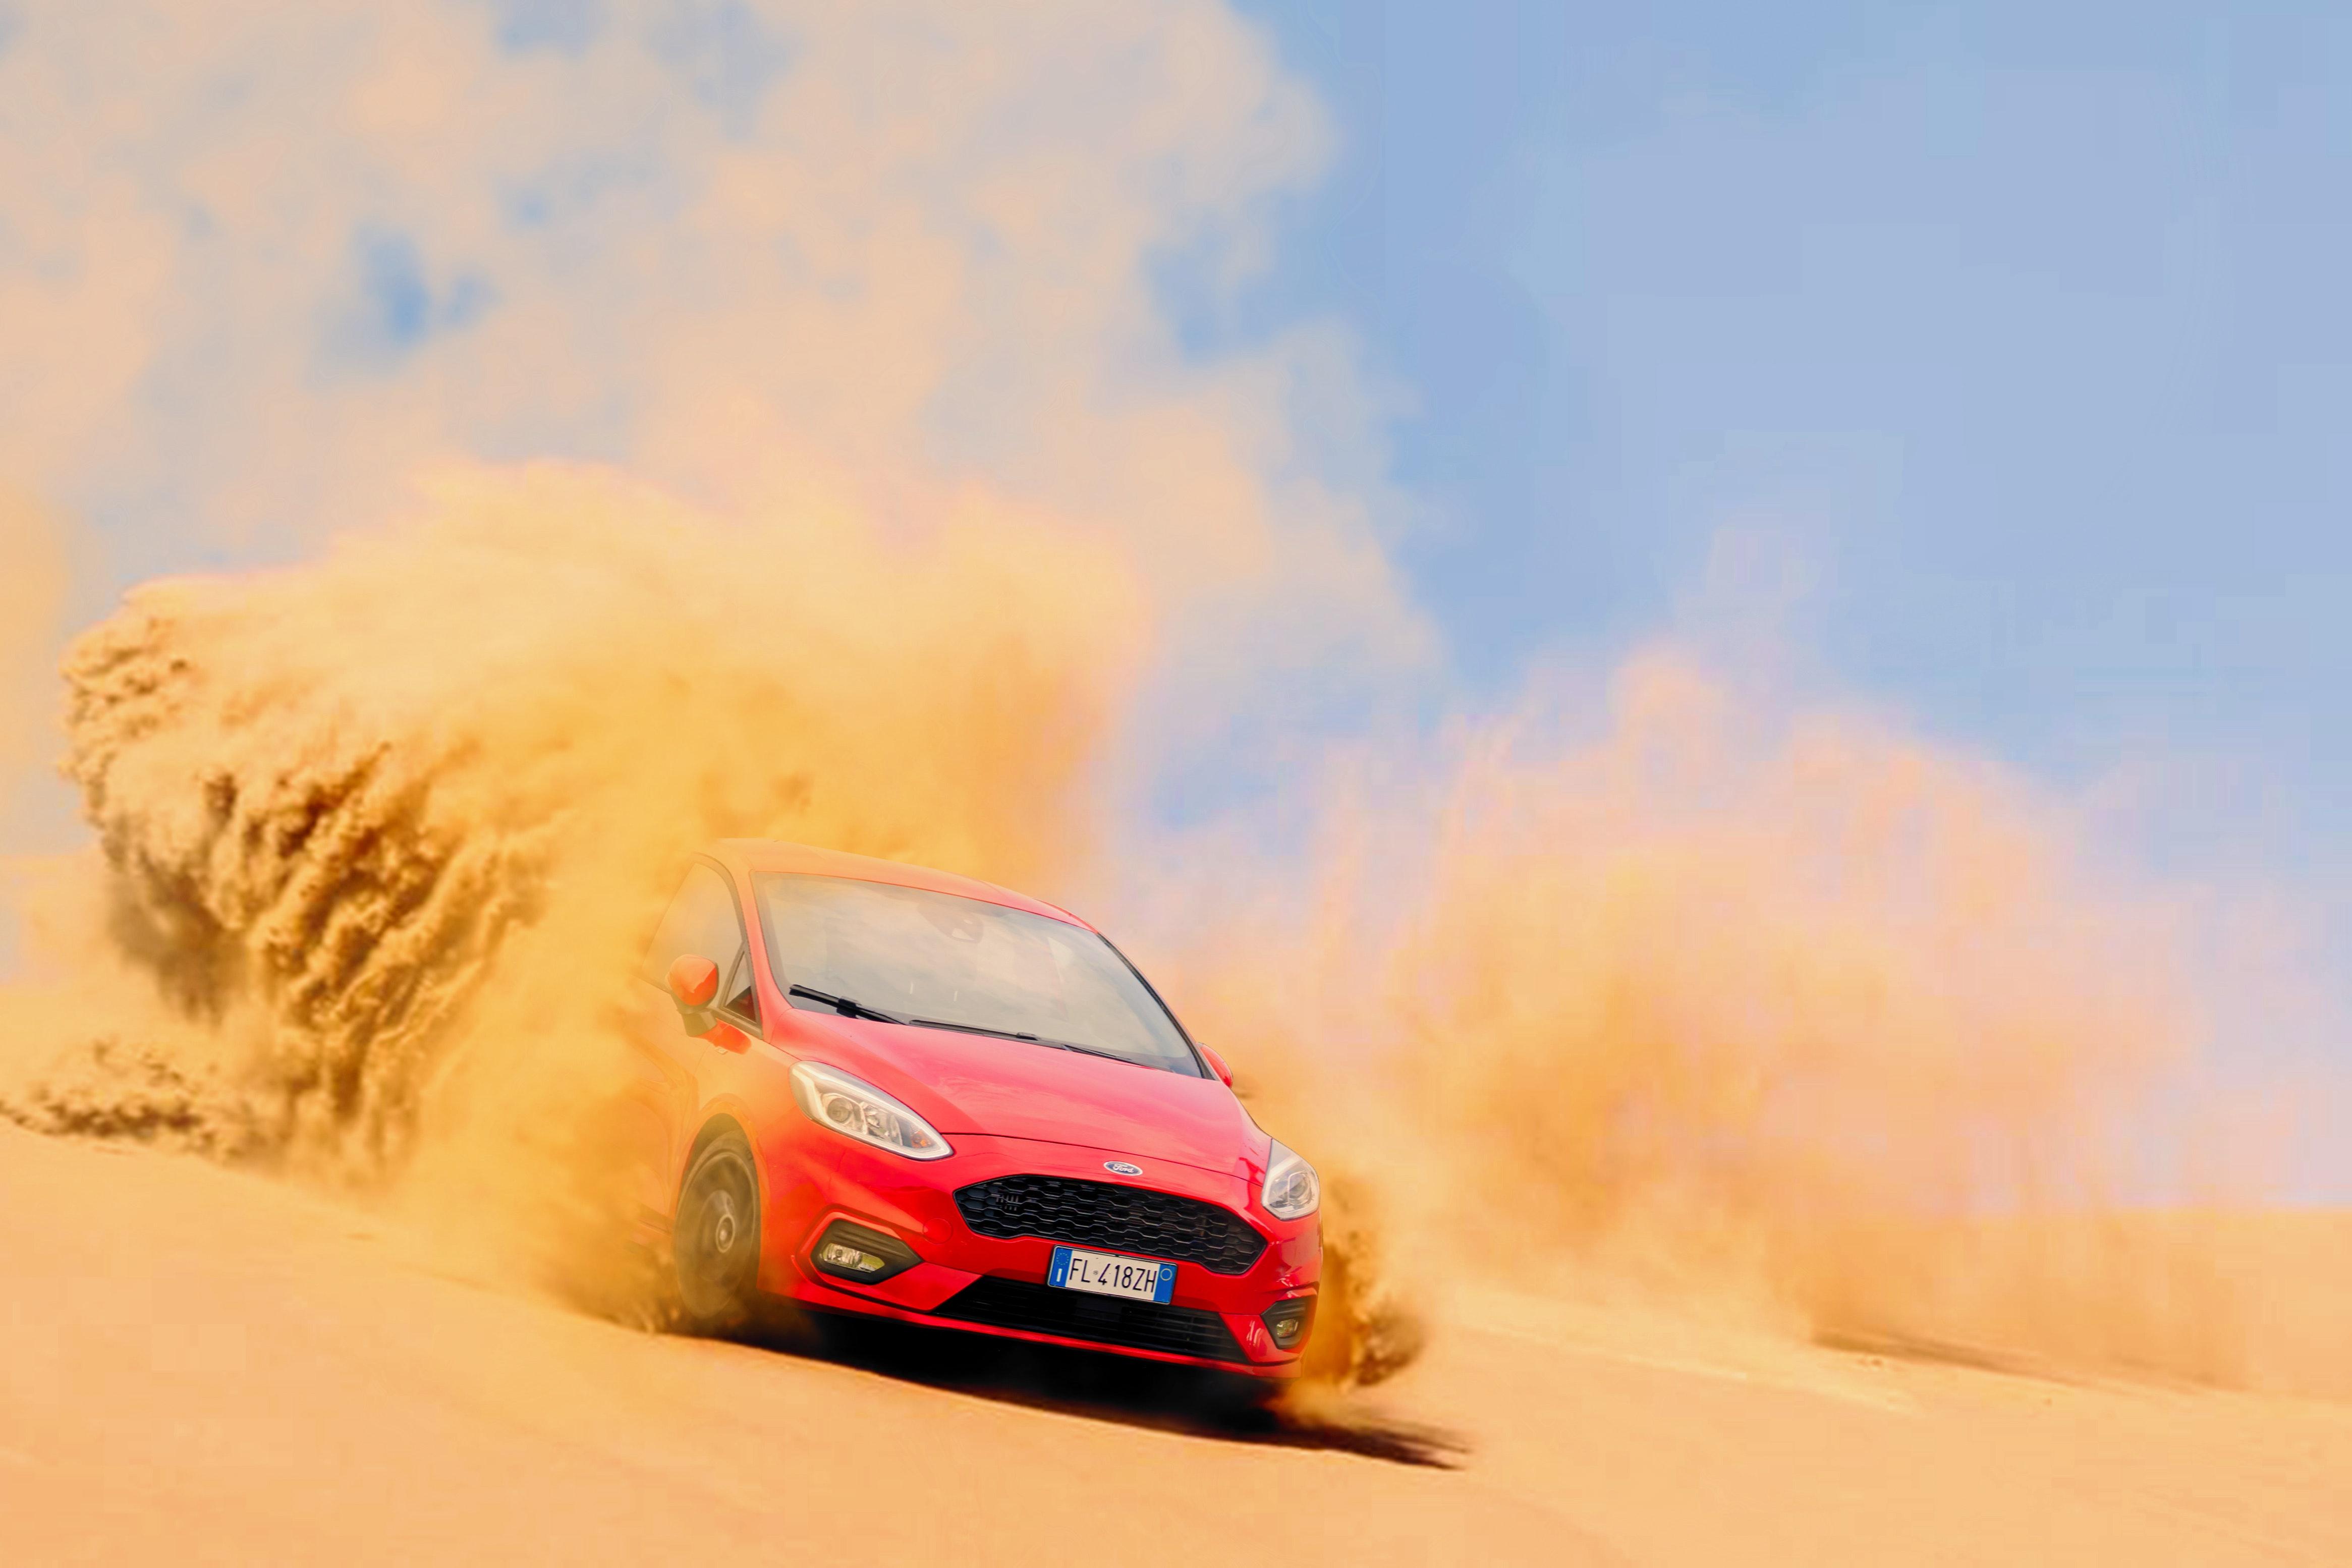 83234 Заставки и Обои Песок на телефон. Скачать Песок, Форд (Ford), Пустыня, Тачки (Cars), Дрифт картинки бесплатно